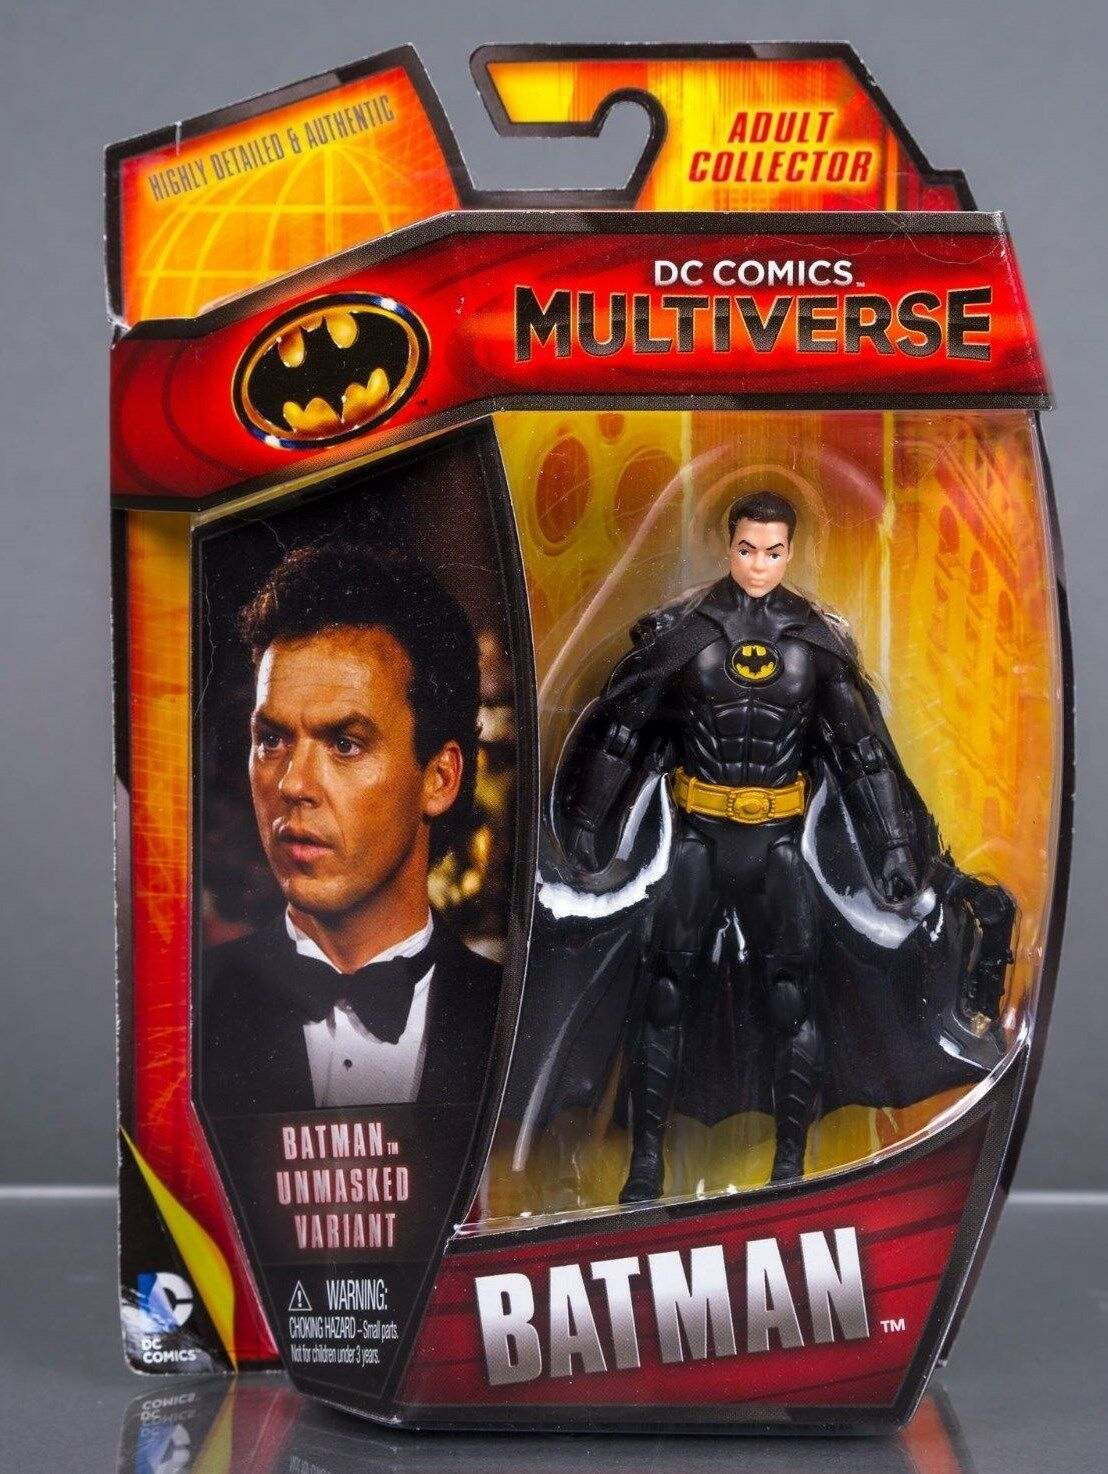 DC COMICS MULTIVERSE BATMAN 1989 KEATON 89 3.75  FIGURE UNMASKED VARIANT CHASE